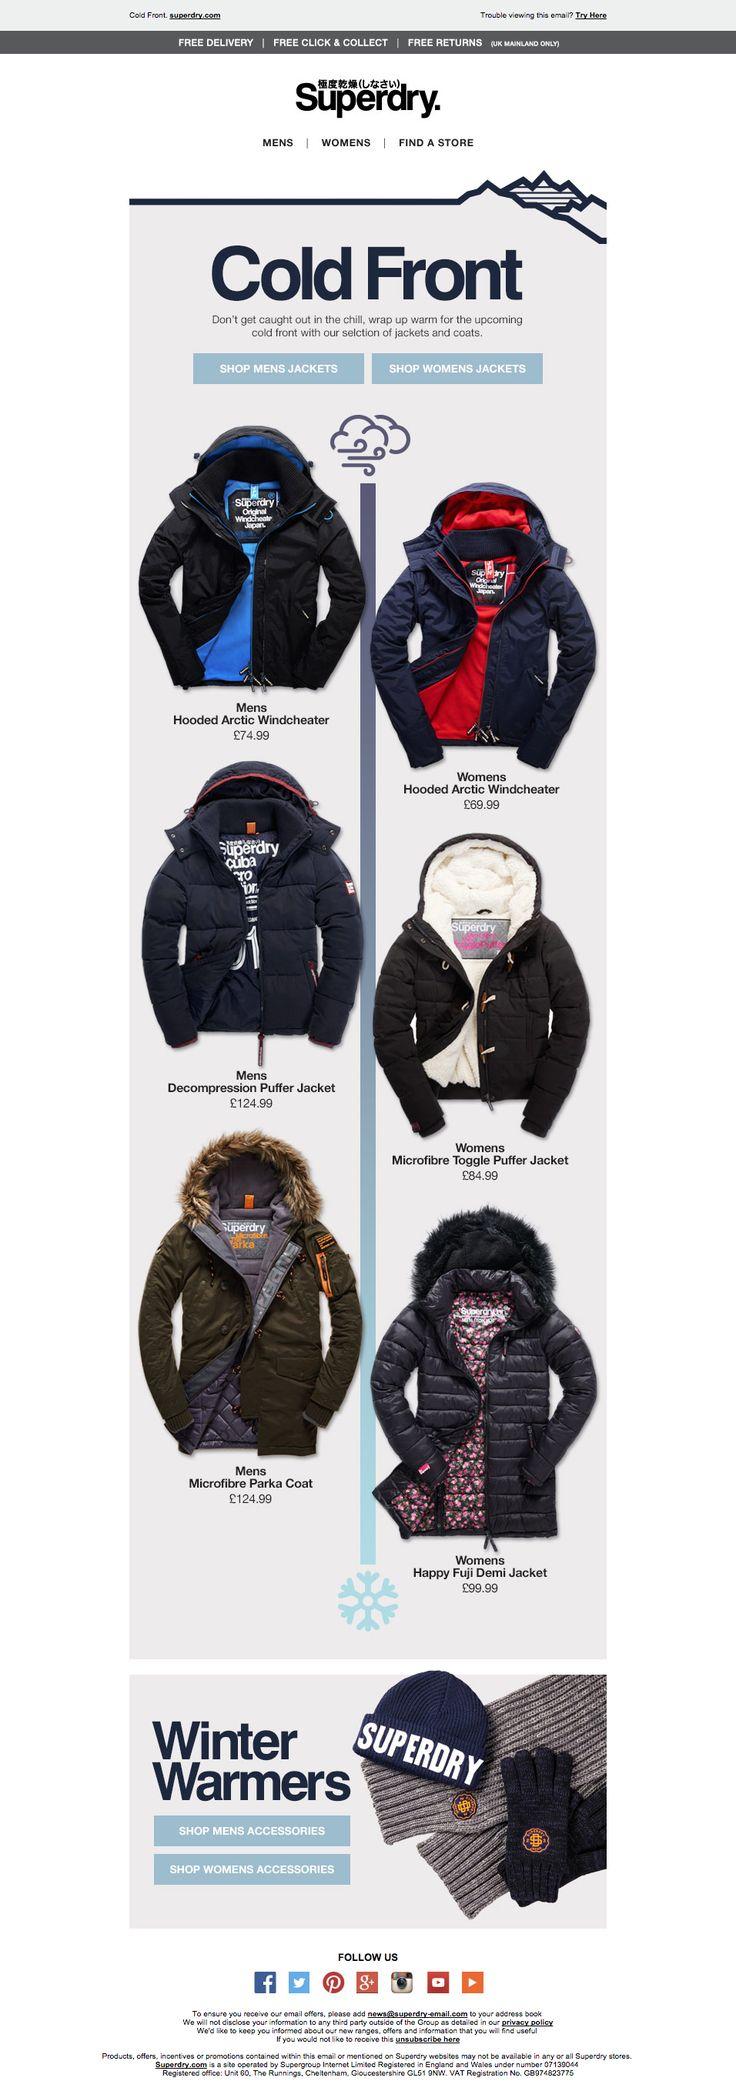 Superdry Cold Weather Email / Newsletter Design